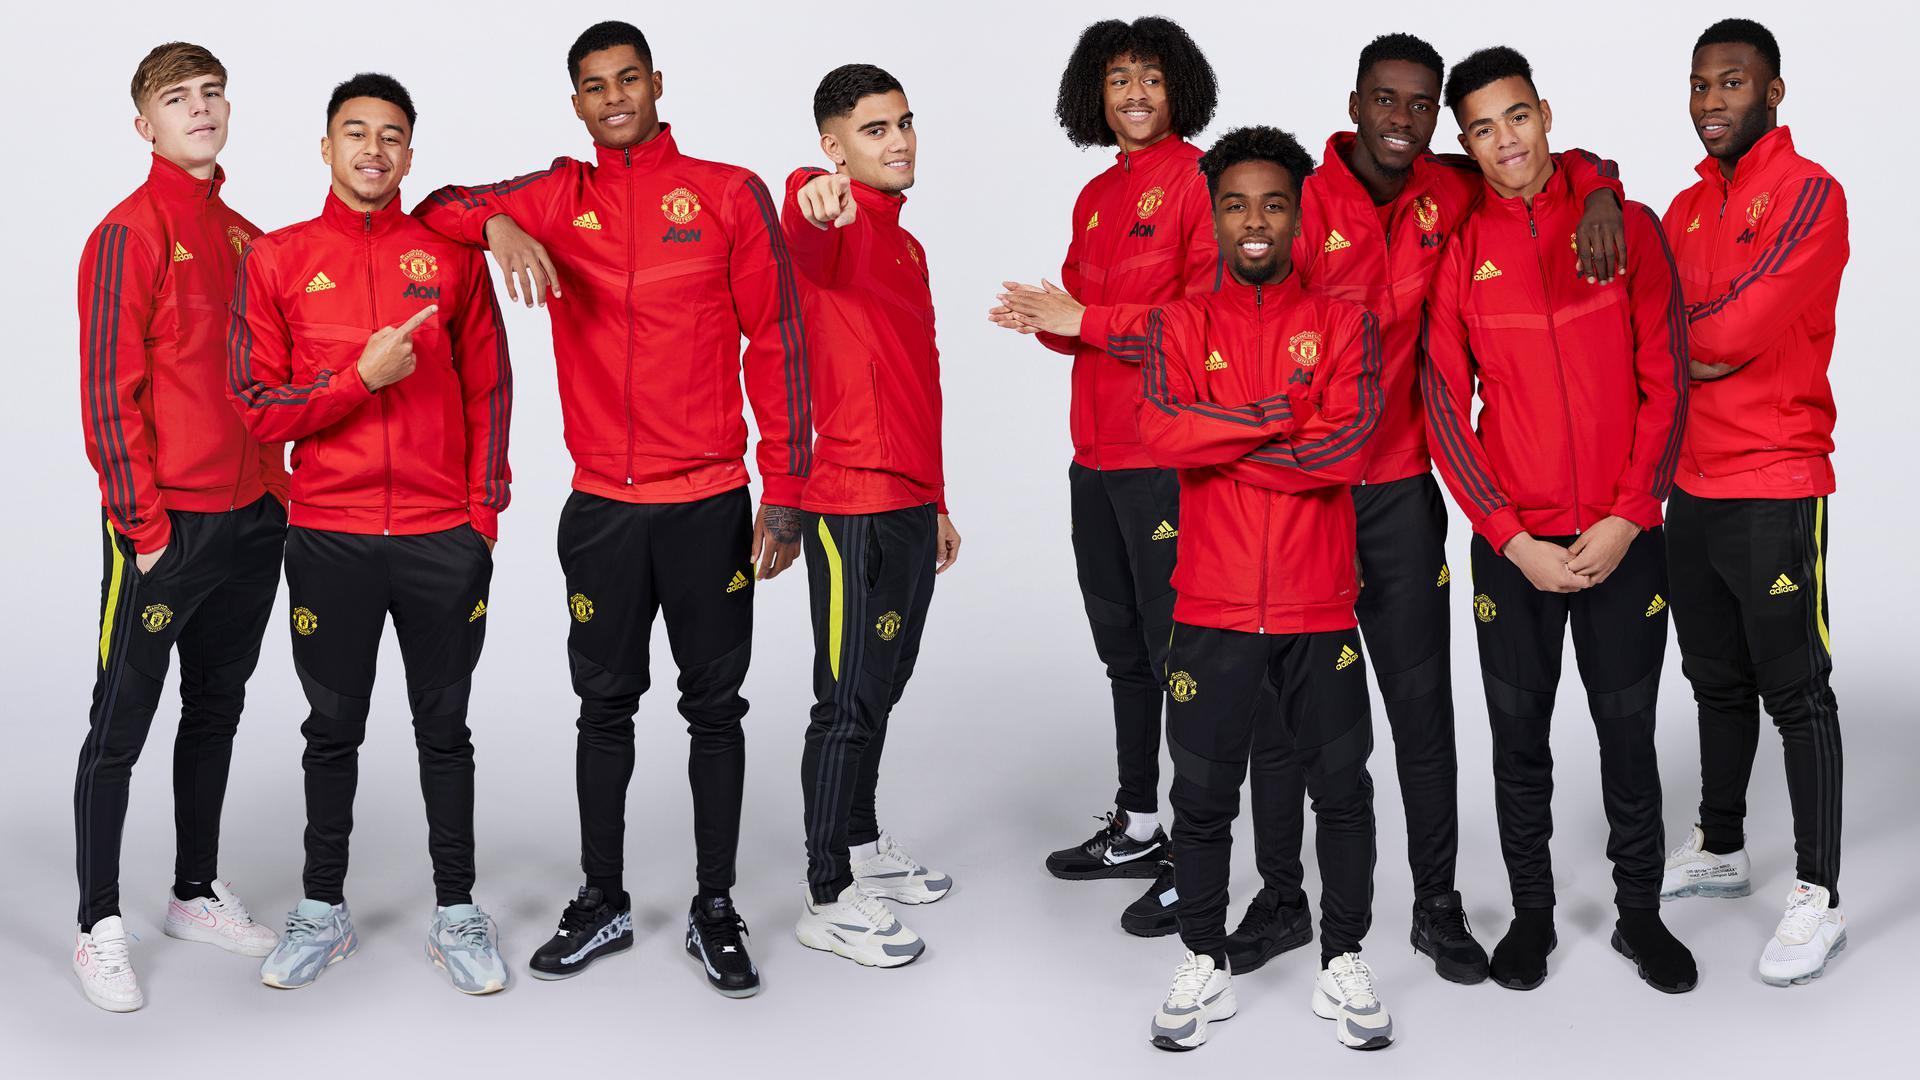 Kisah 4 000 Laga Manchester United Bersama Pemain Akademi